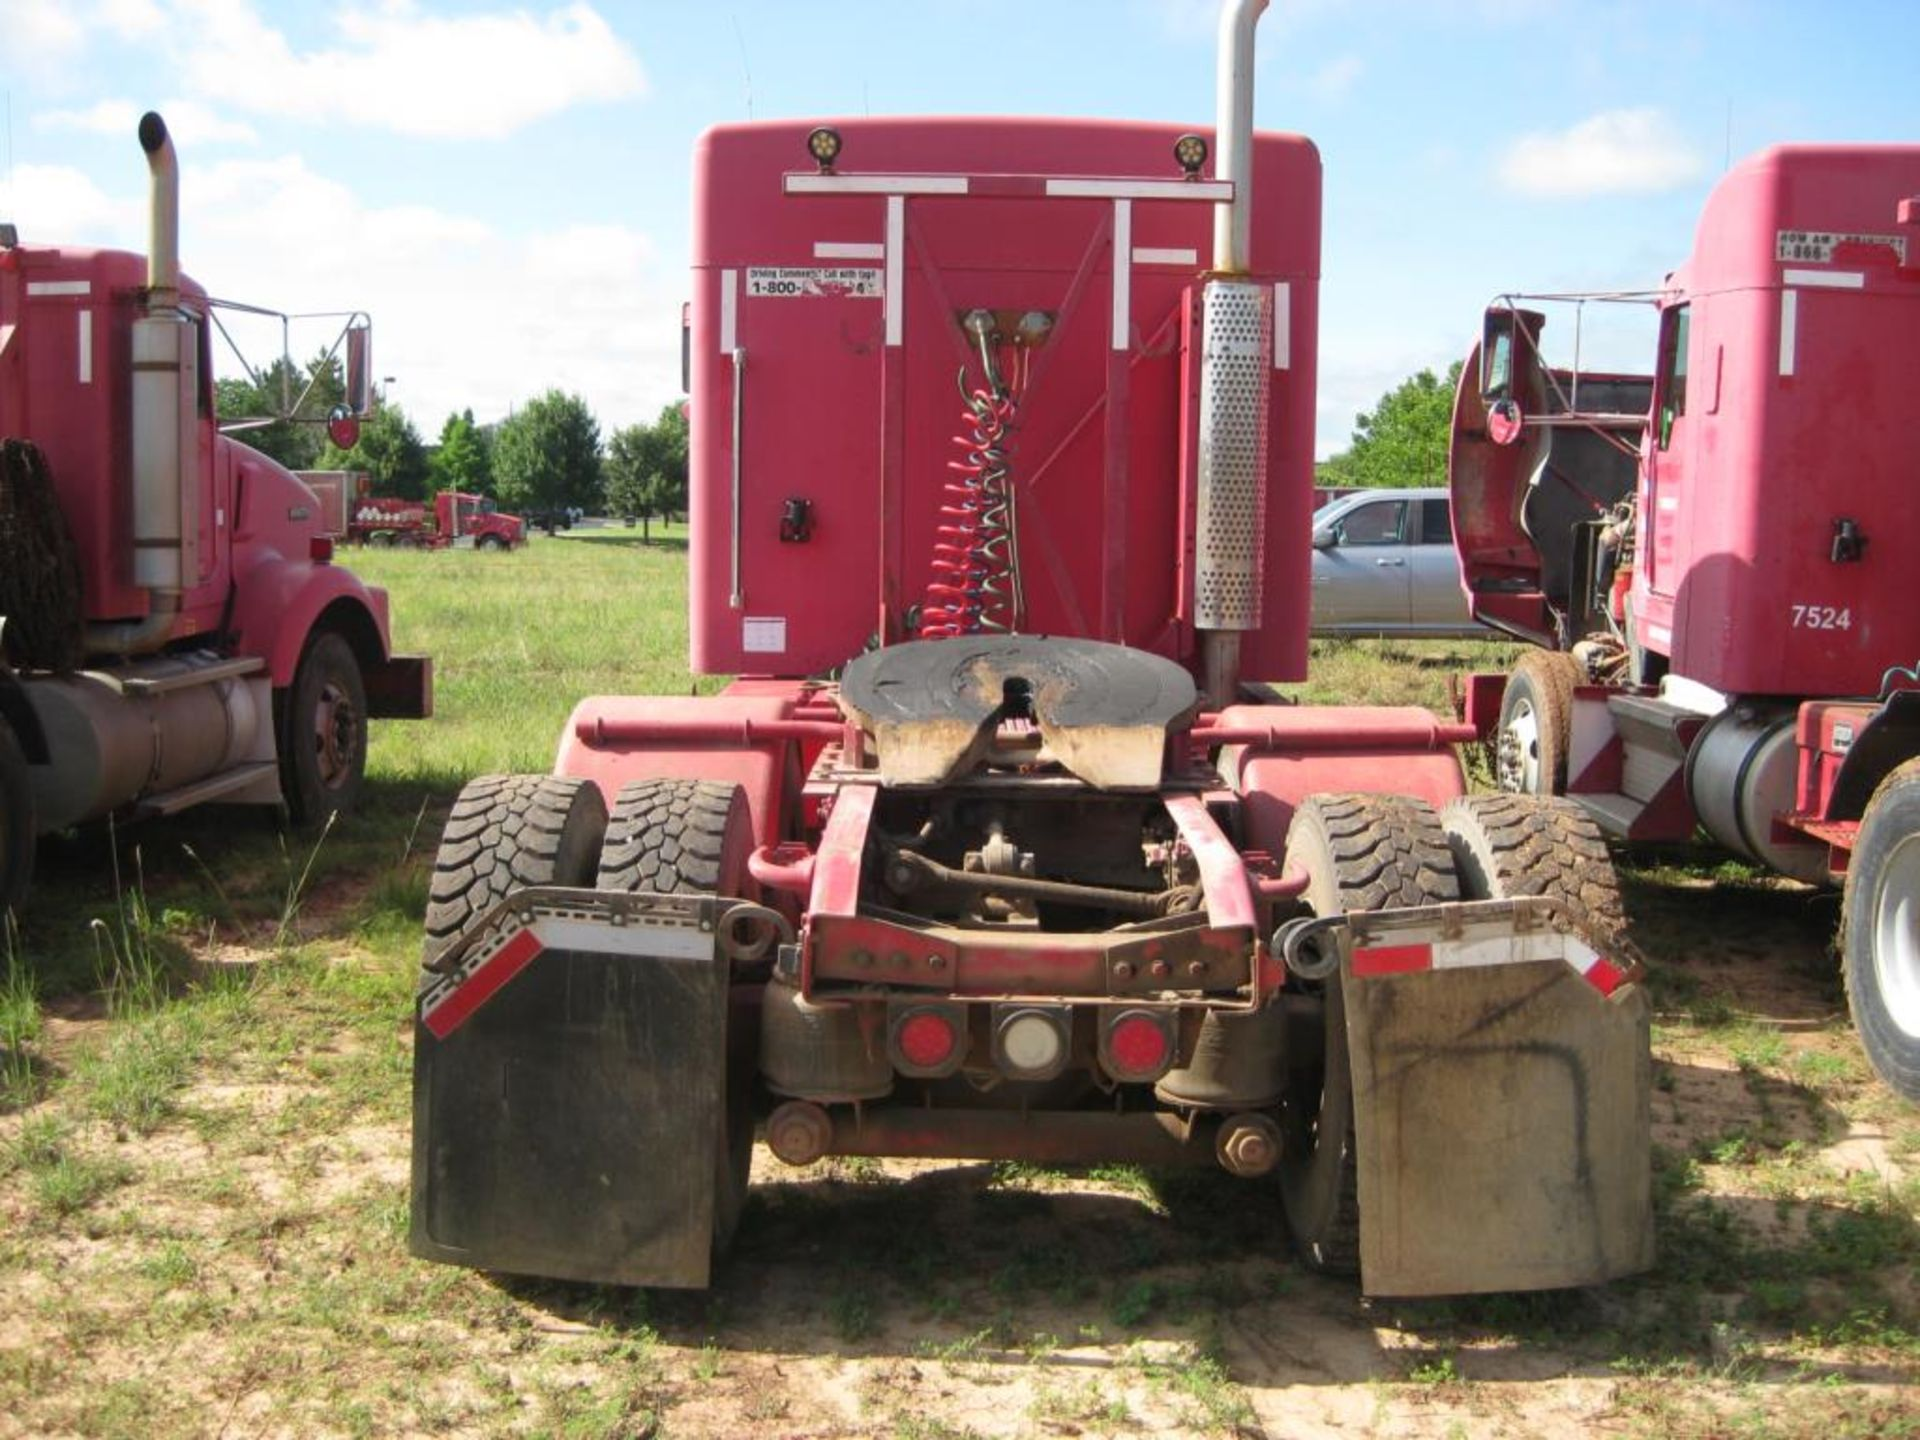 Kenworth Truck - Image 6 of 21